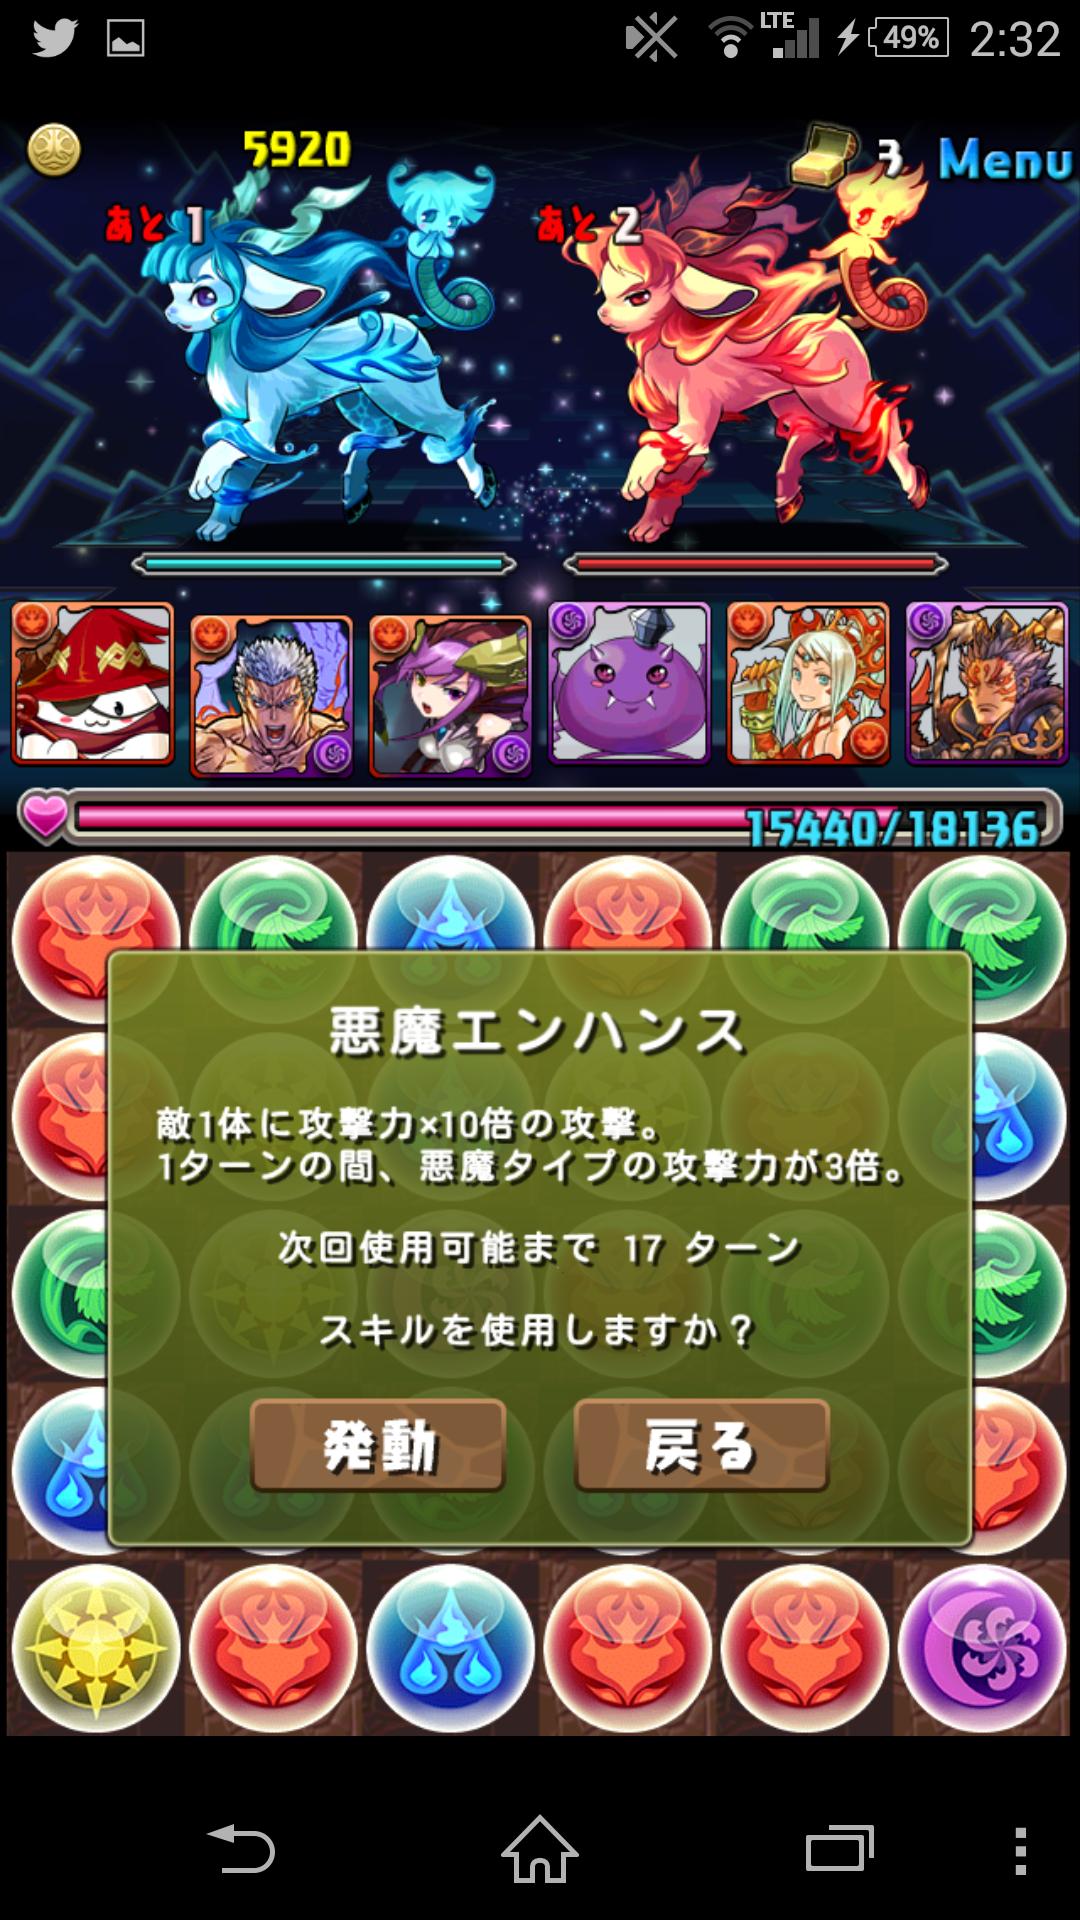 Screenshot_2015-02-18-02-32-41.png